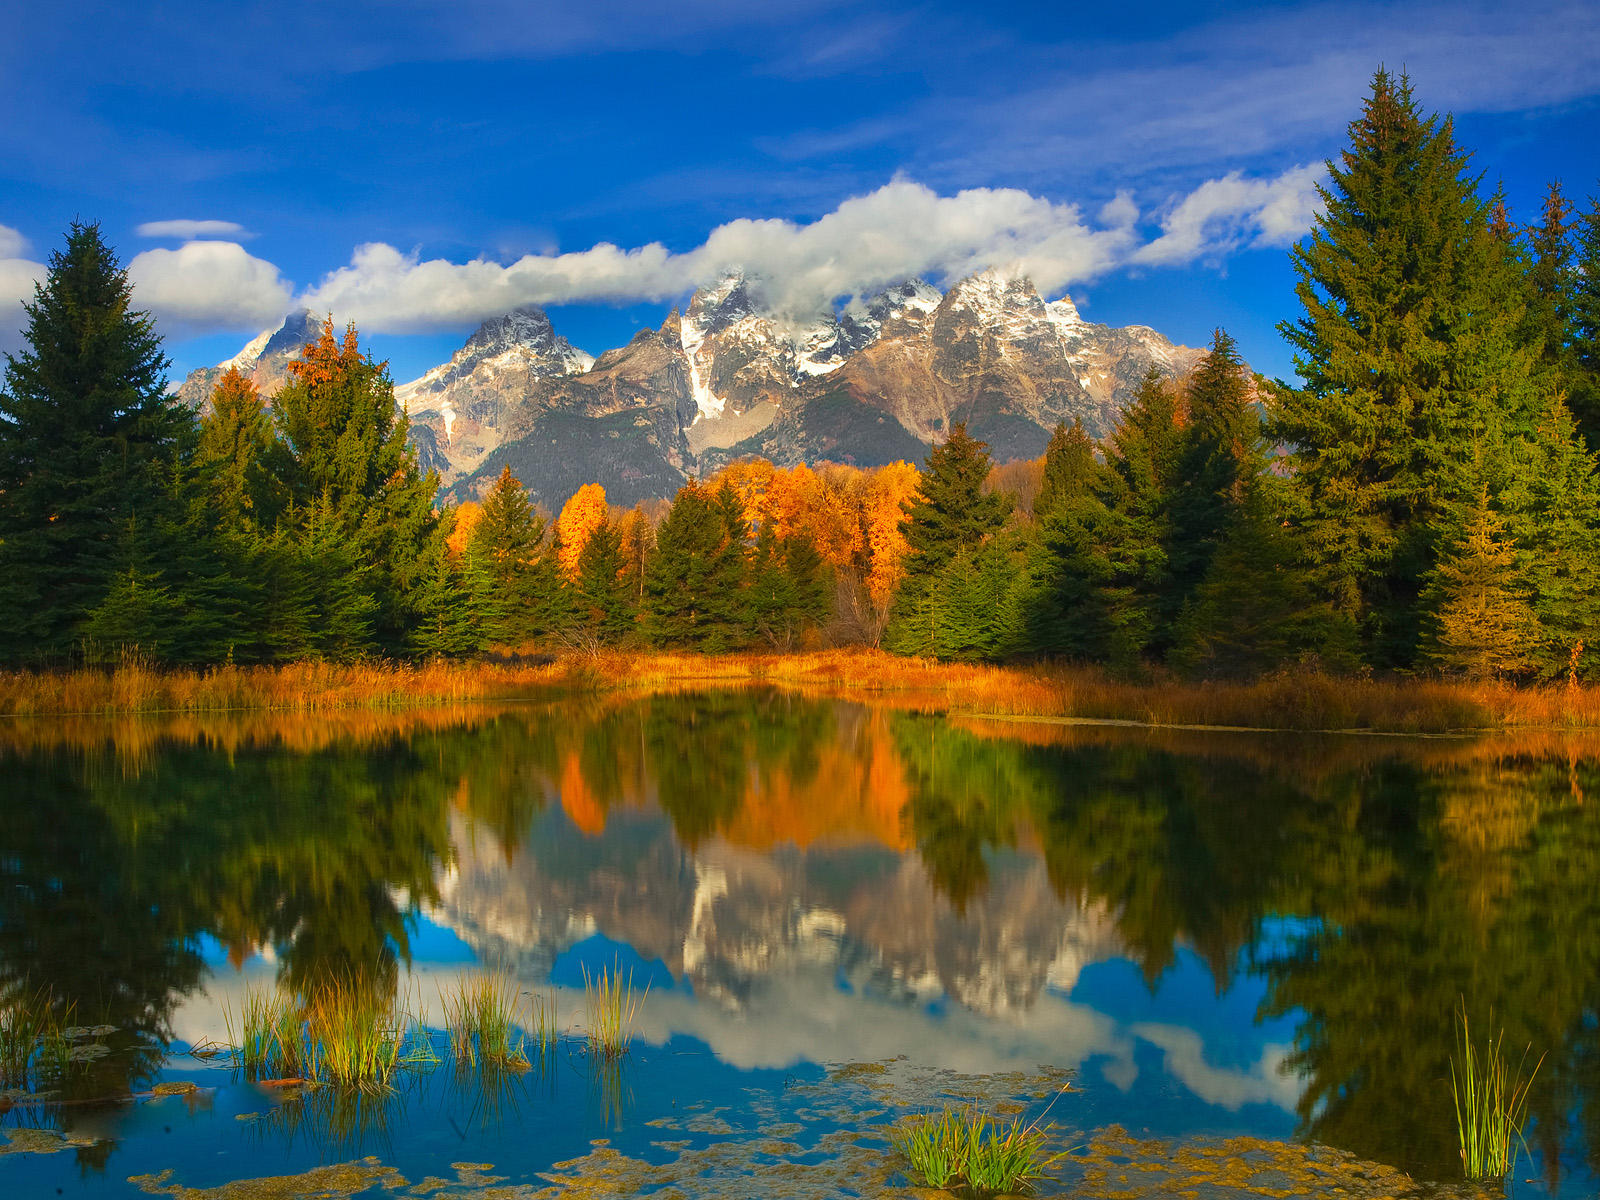 Fall Colors Wallpaper New England Wyoming Images Hd Desktop Wallpapers 4k Hd